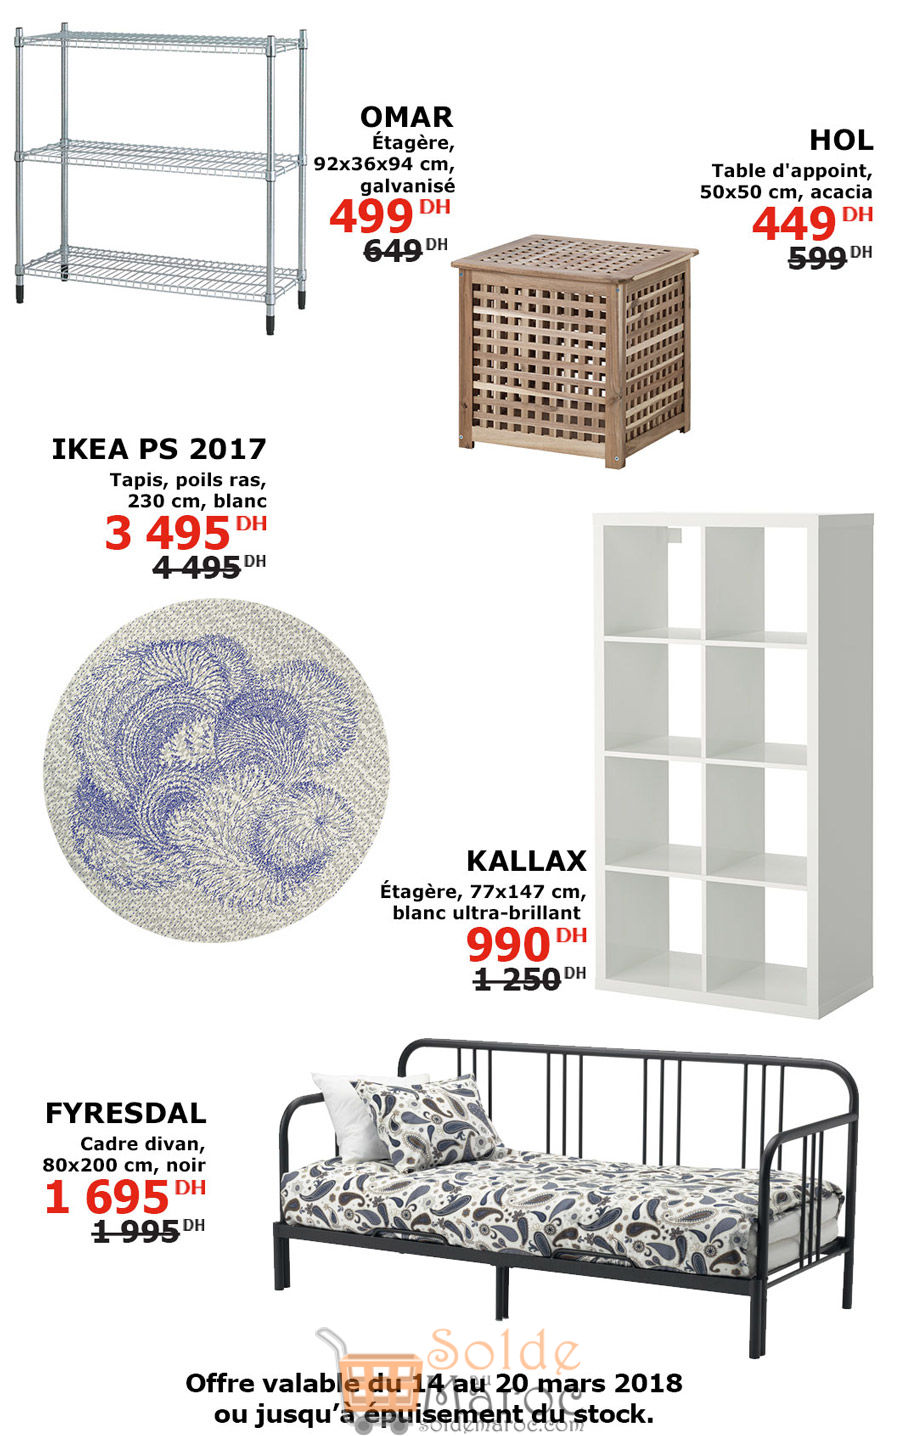 offres incroyable ikea maroc jusqu au 20 mars 2018 solde et promotion du maroc. Black Bedroom Furniture Sets. Home Design Ideas